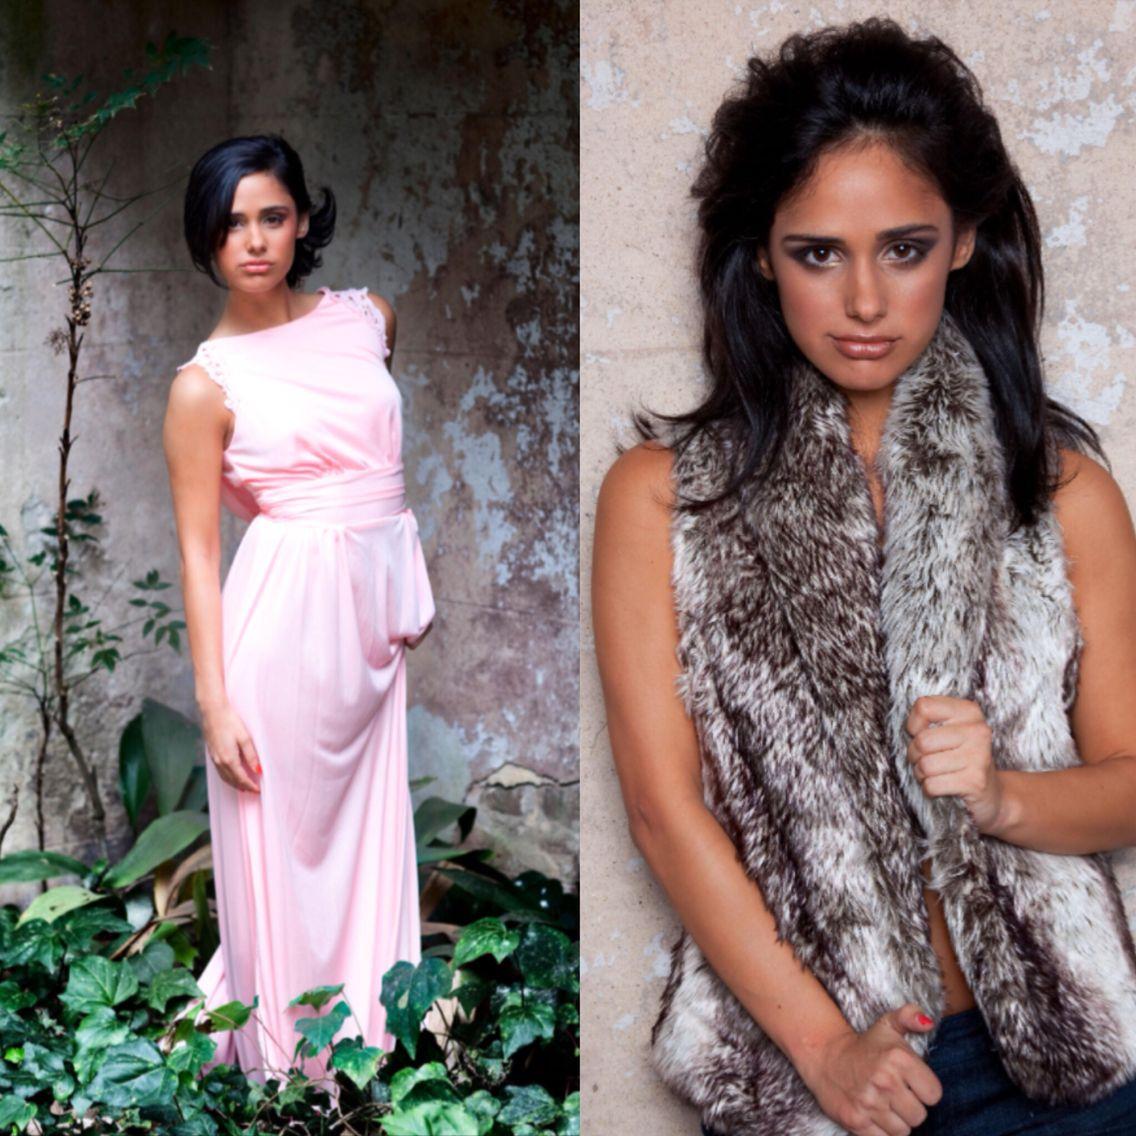 FASHION   Editorial   Hair & Makeup - Savannah, GA #aemei #mua #makeupartist #fashion #photoshoot #editorial #model